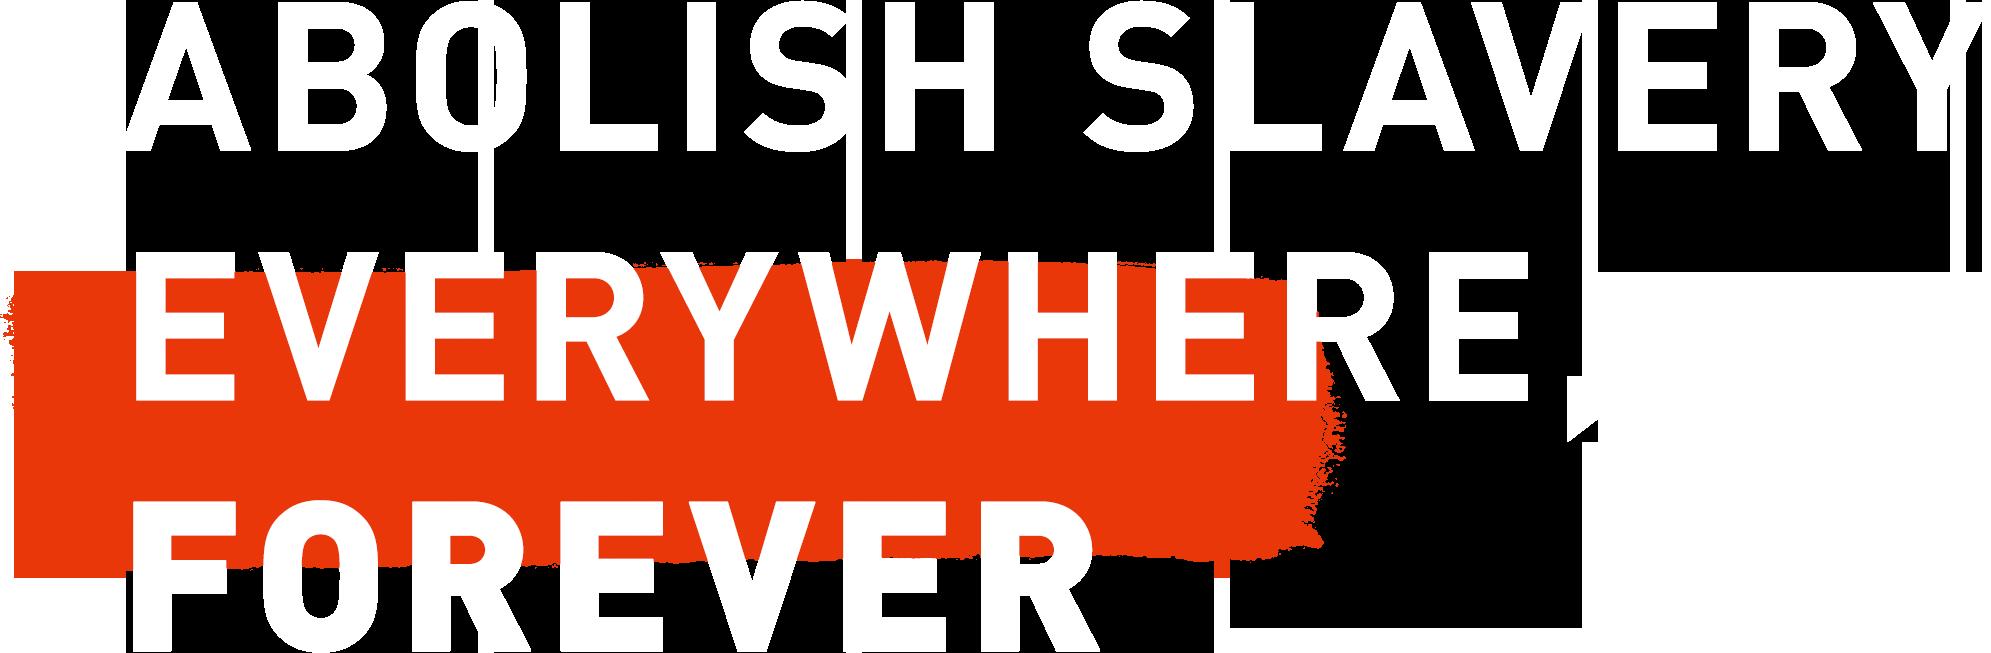 Abolish Slavery Everywhere, Forever A21